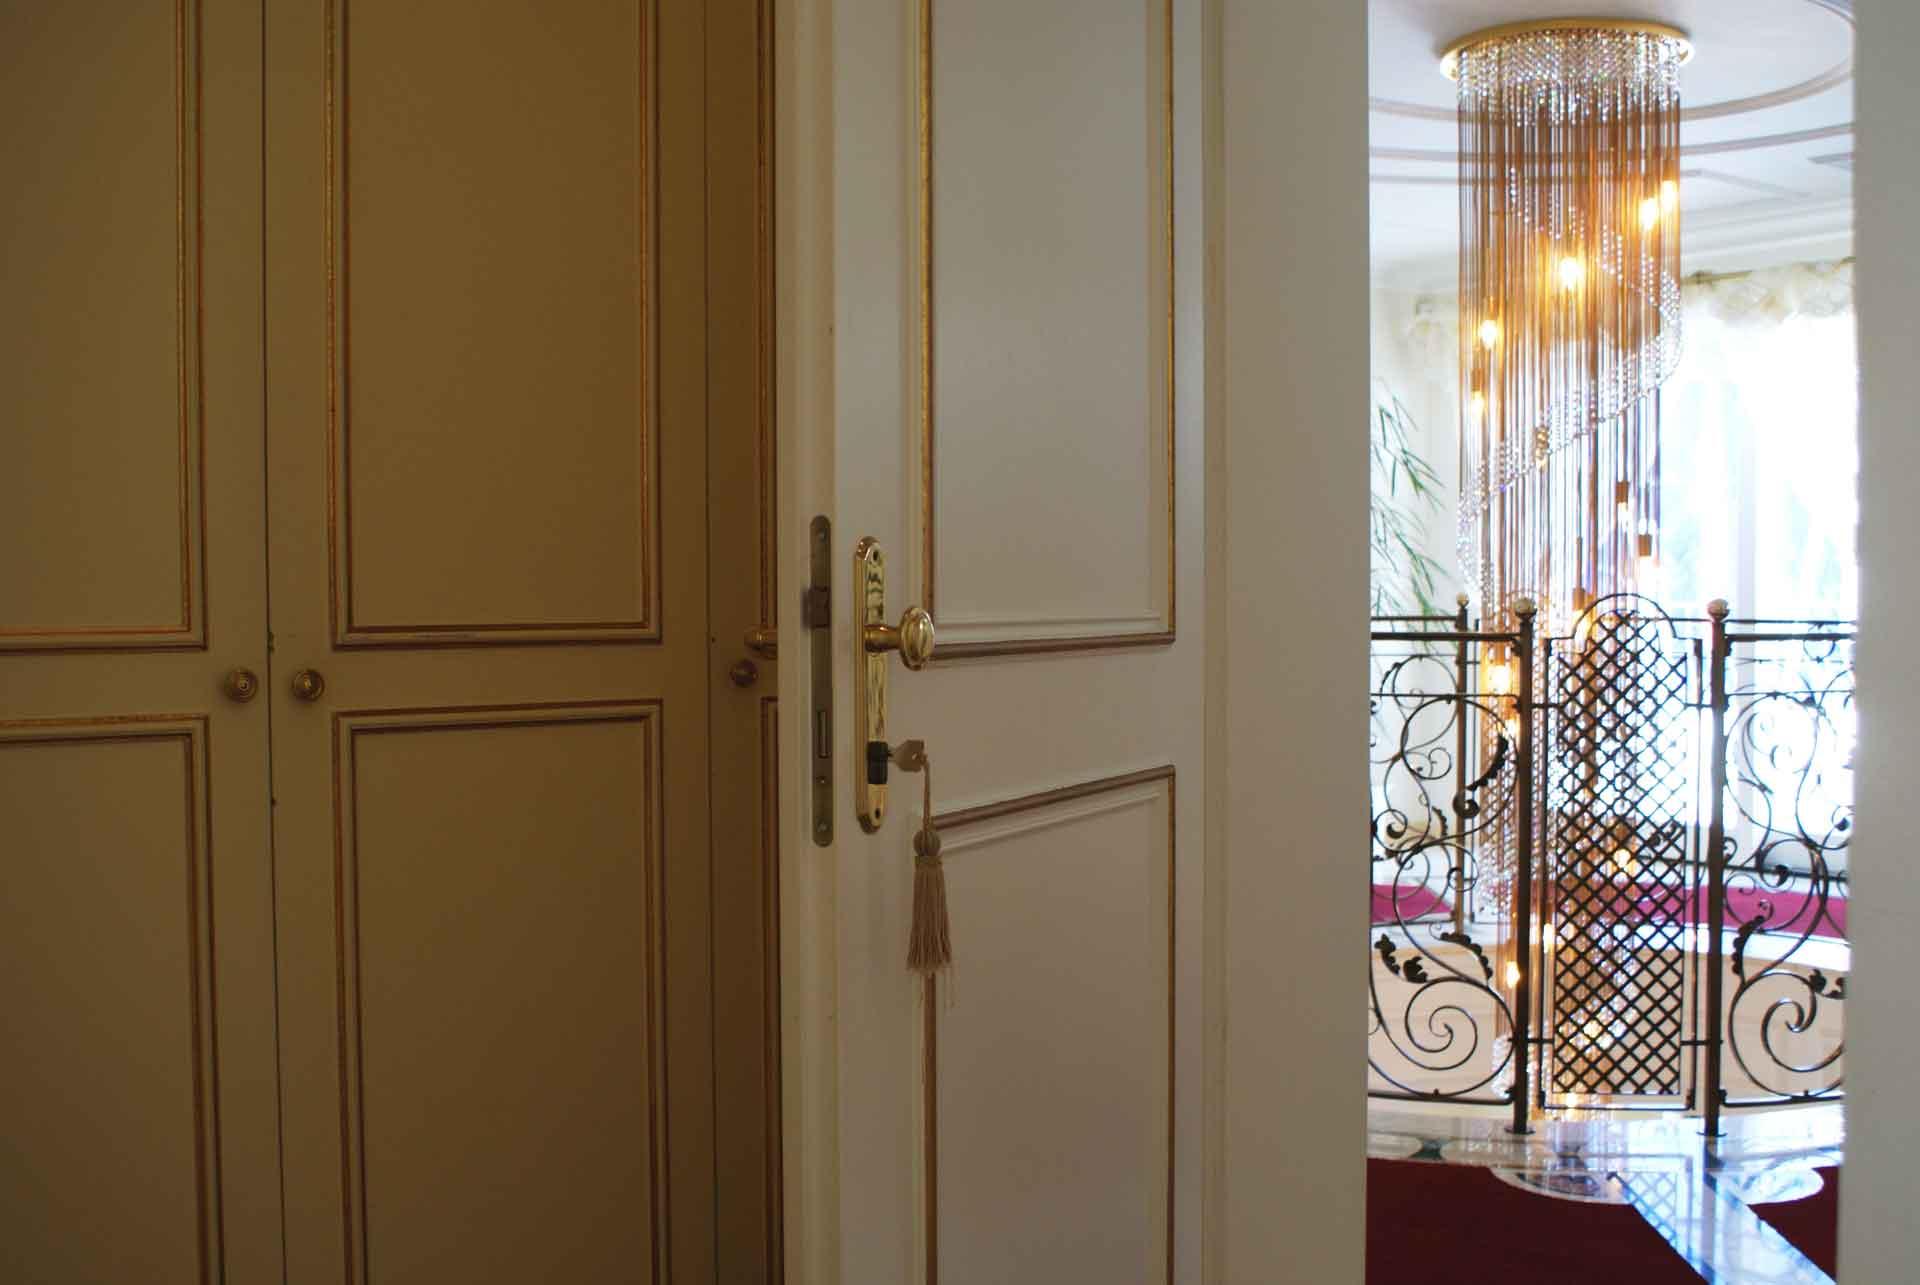 Romantik Urlaub im Ahrntal - Doppelzimmer Sissi